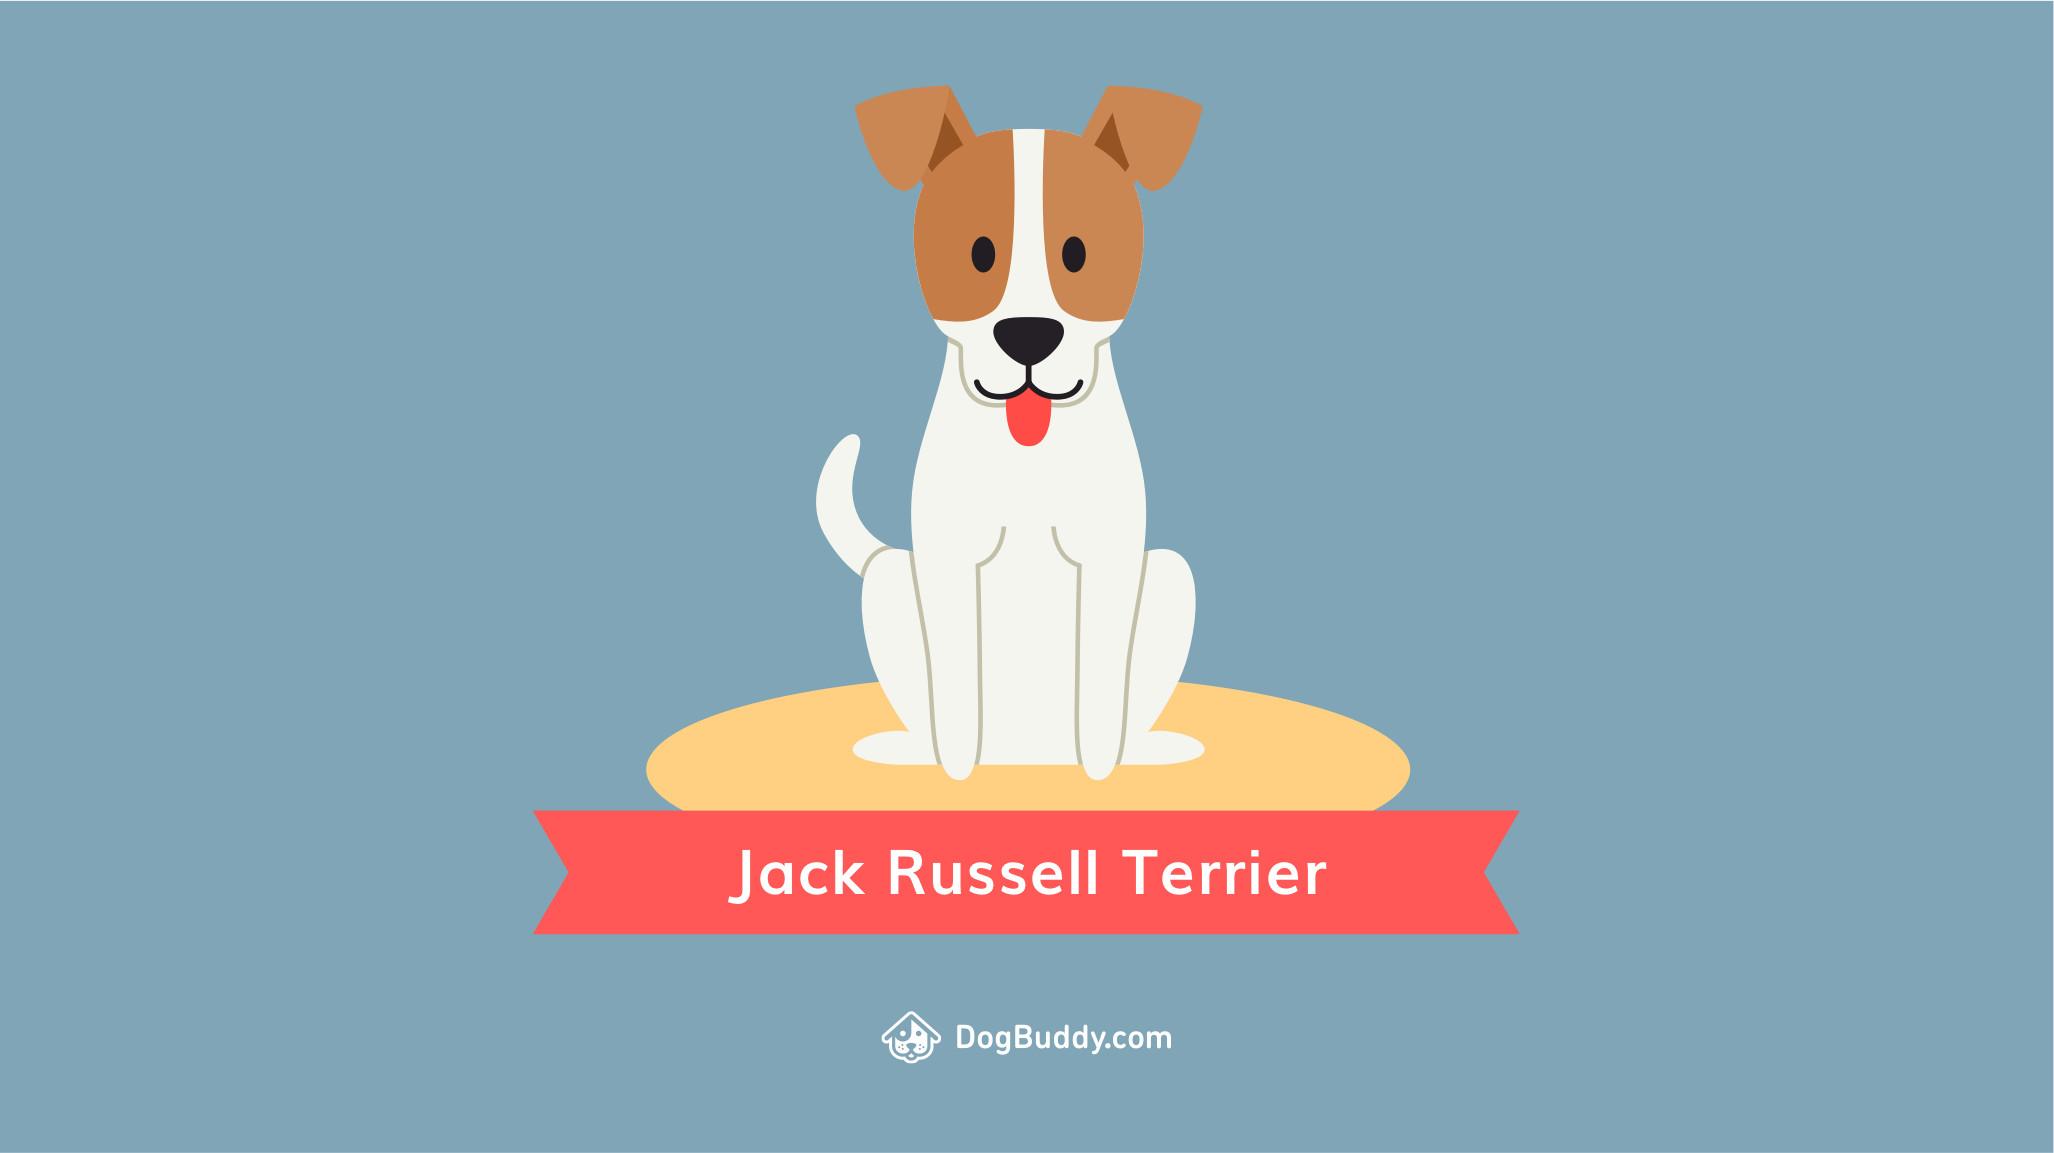 Jack Russell Terrier Wallpaper (61+ images) Jack Russell Terrier Wallpaper